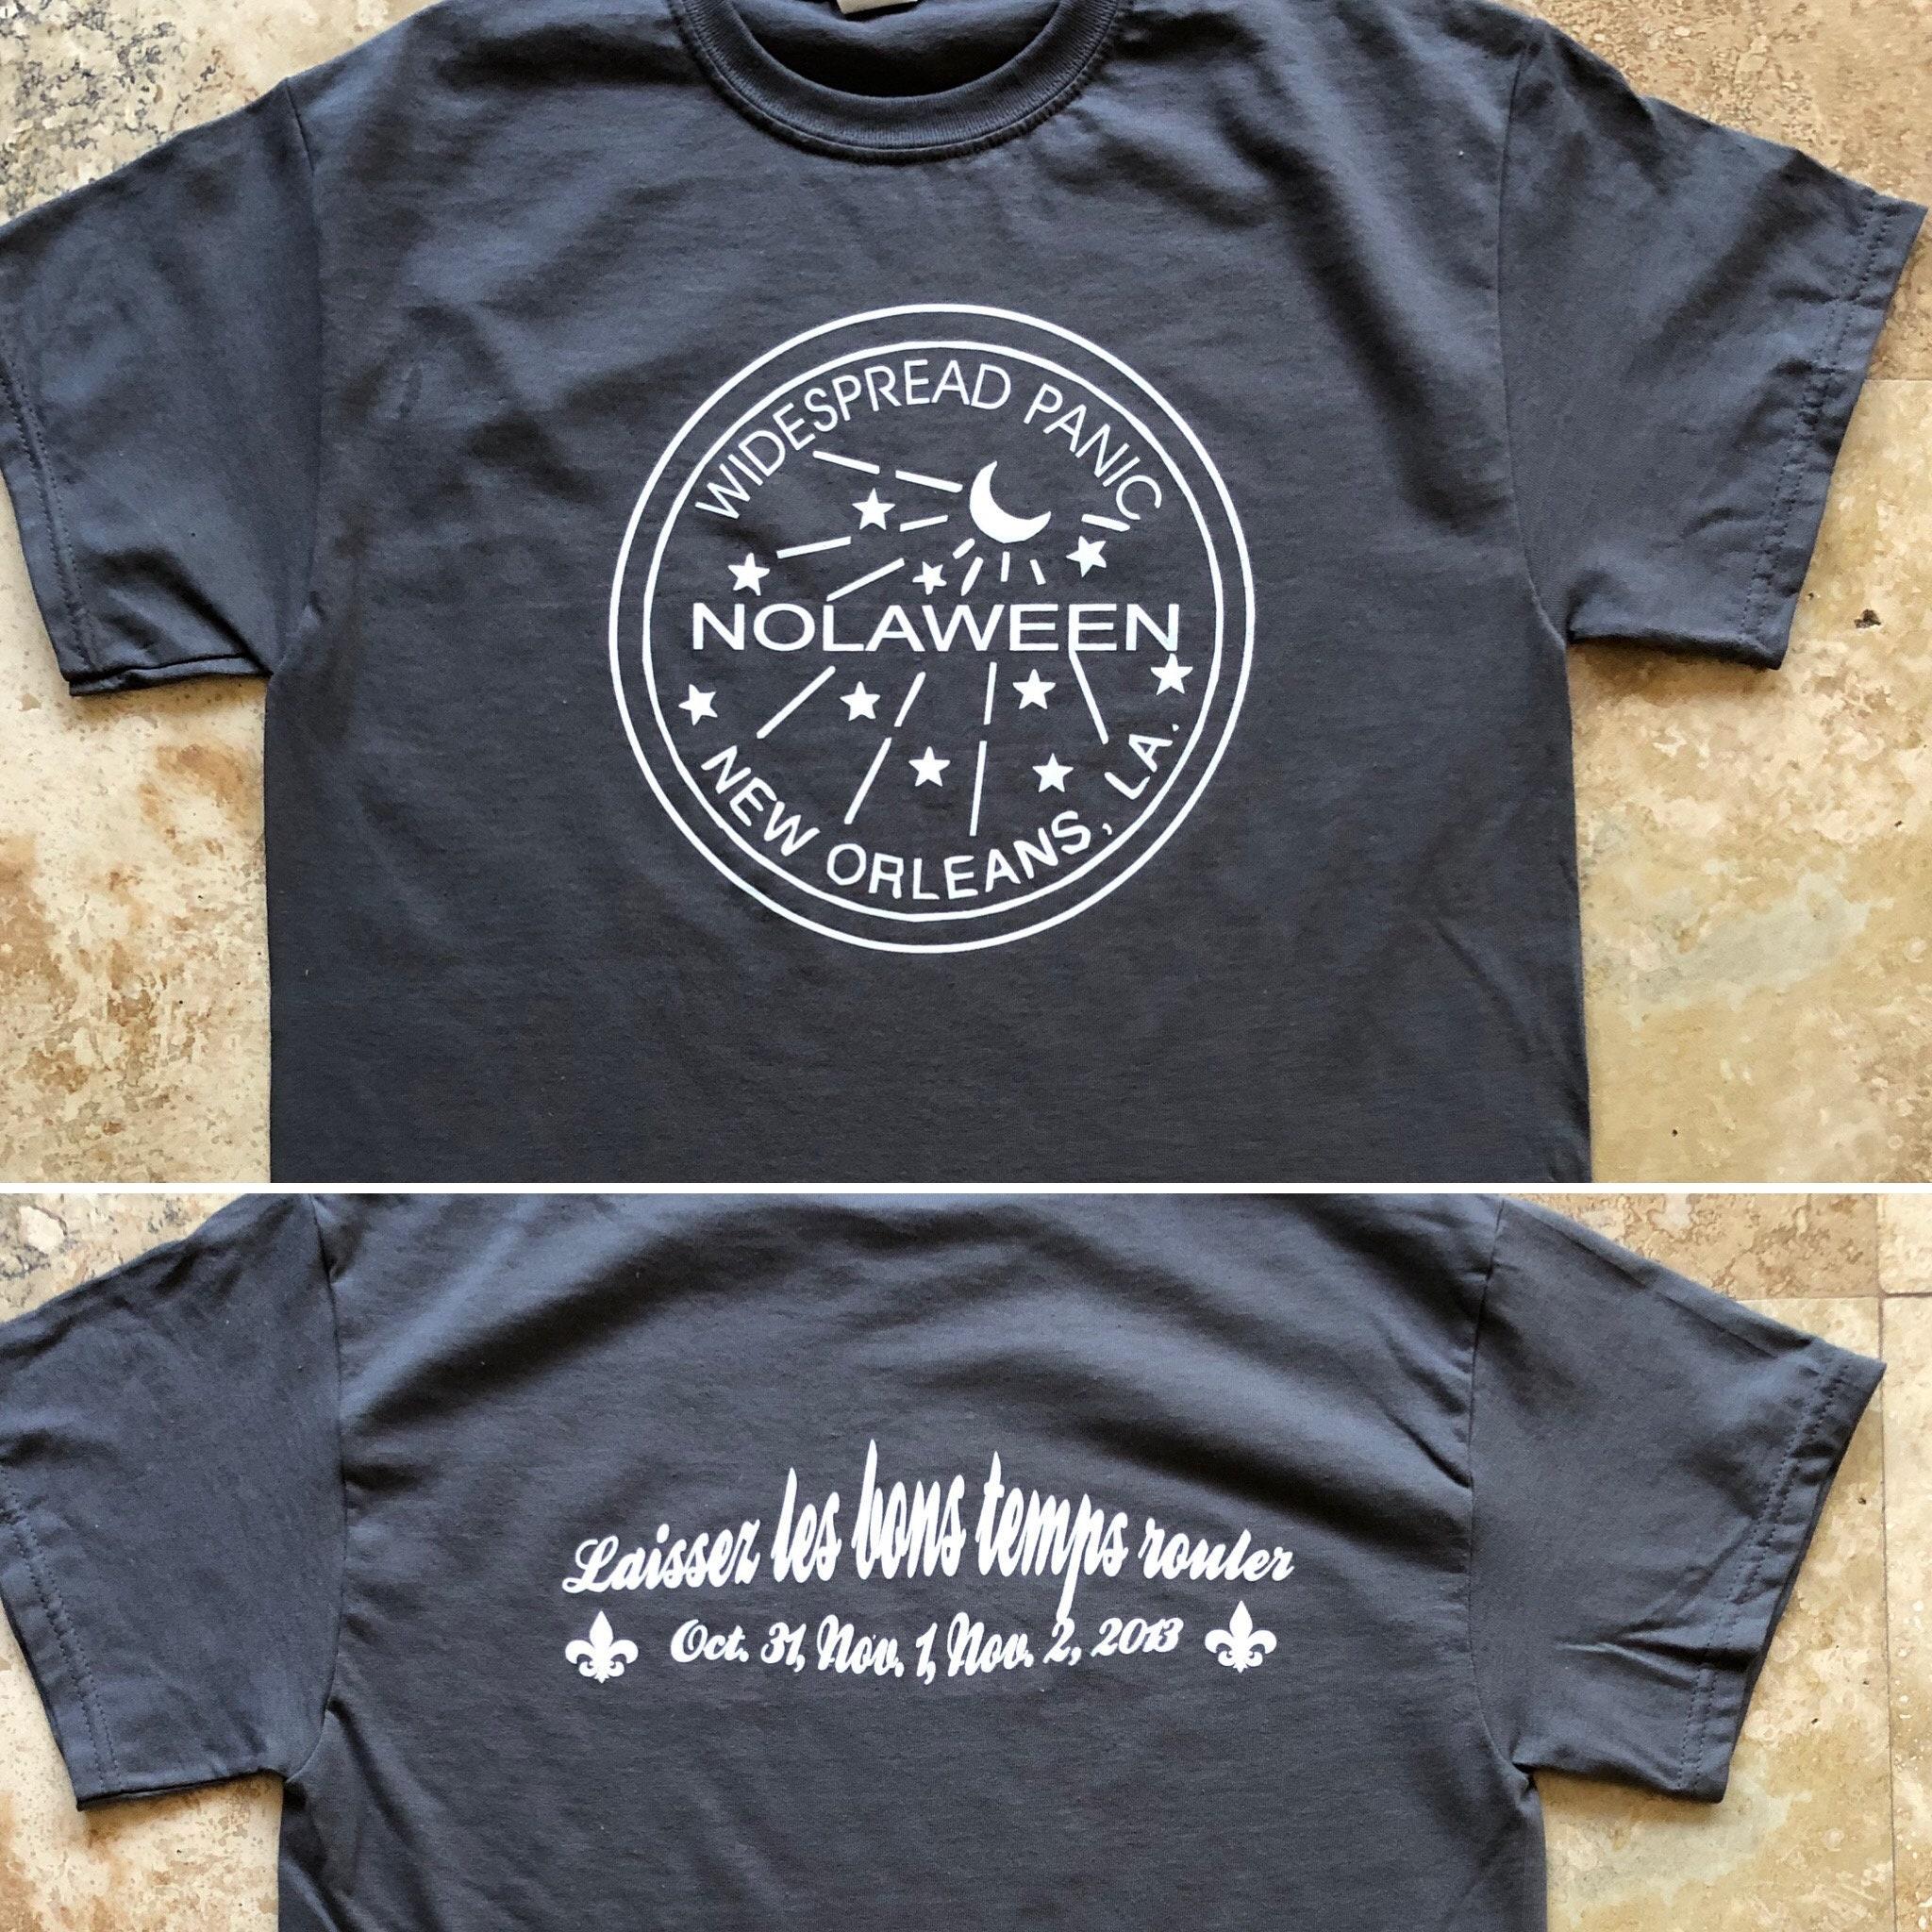 128adc9c15fcf Widespread Panic Shirt-New Orleans NOLA Halloween 2013-Adult Uni T Shirt  Sizes S M L XL XXL-Charcoal Grey T Shirt